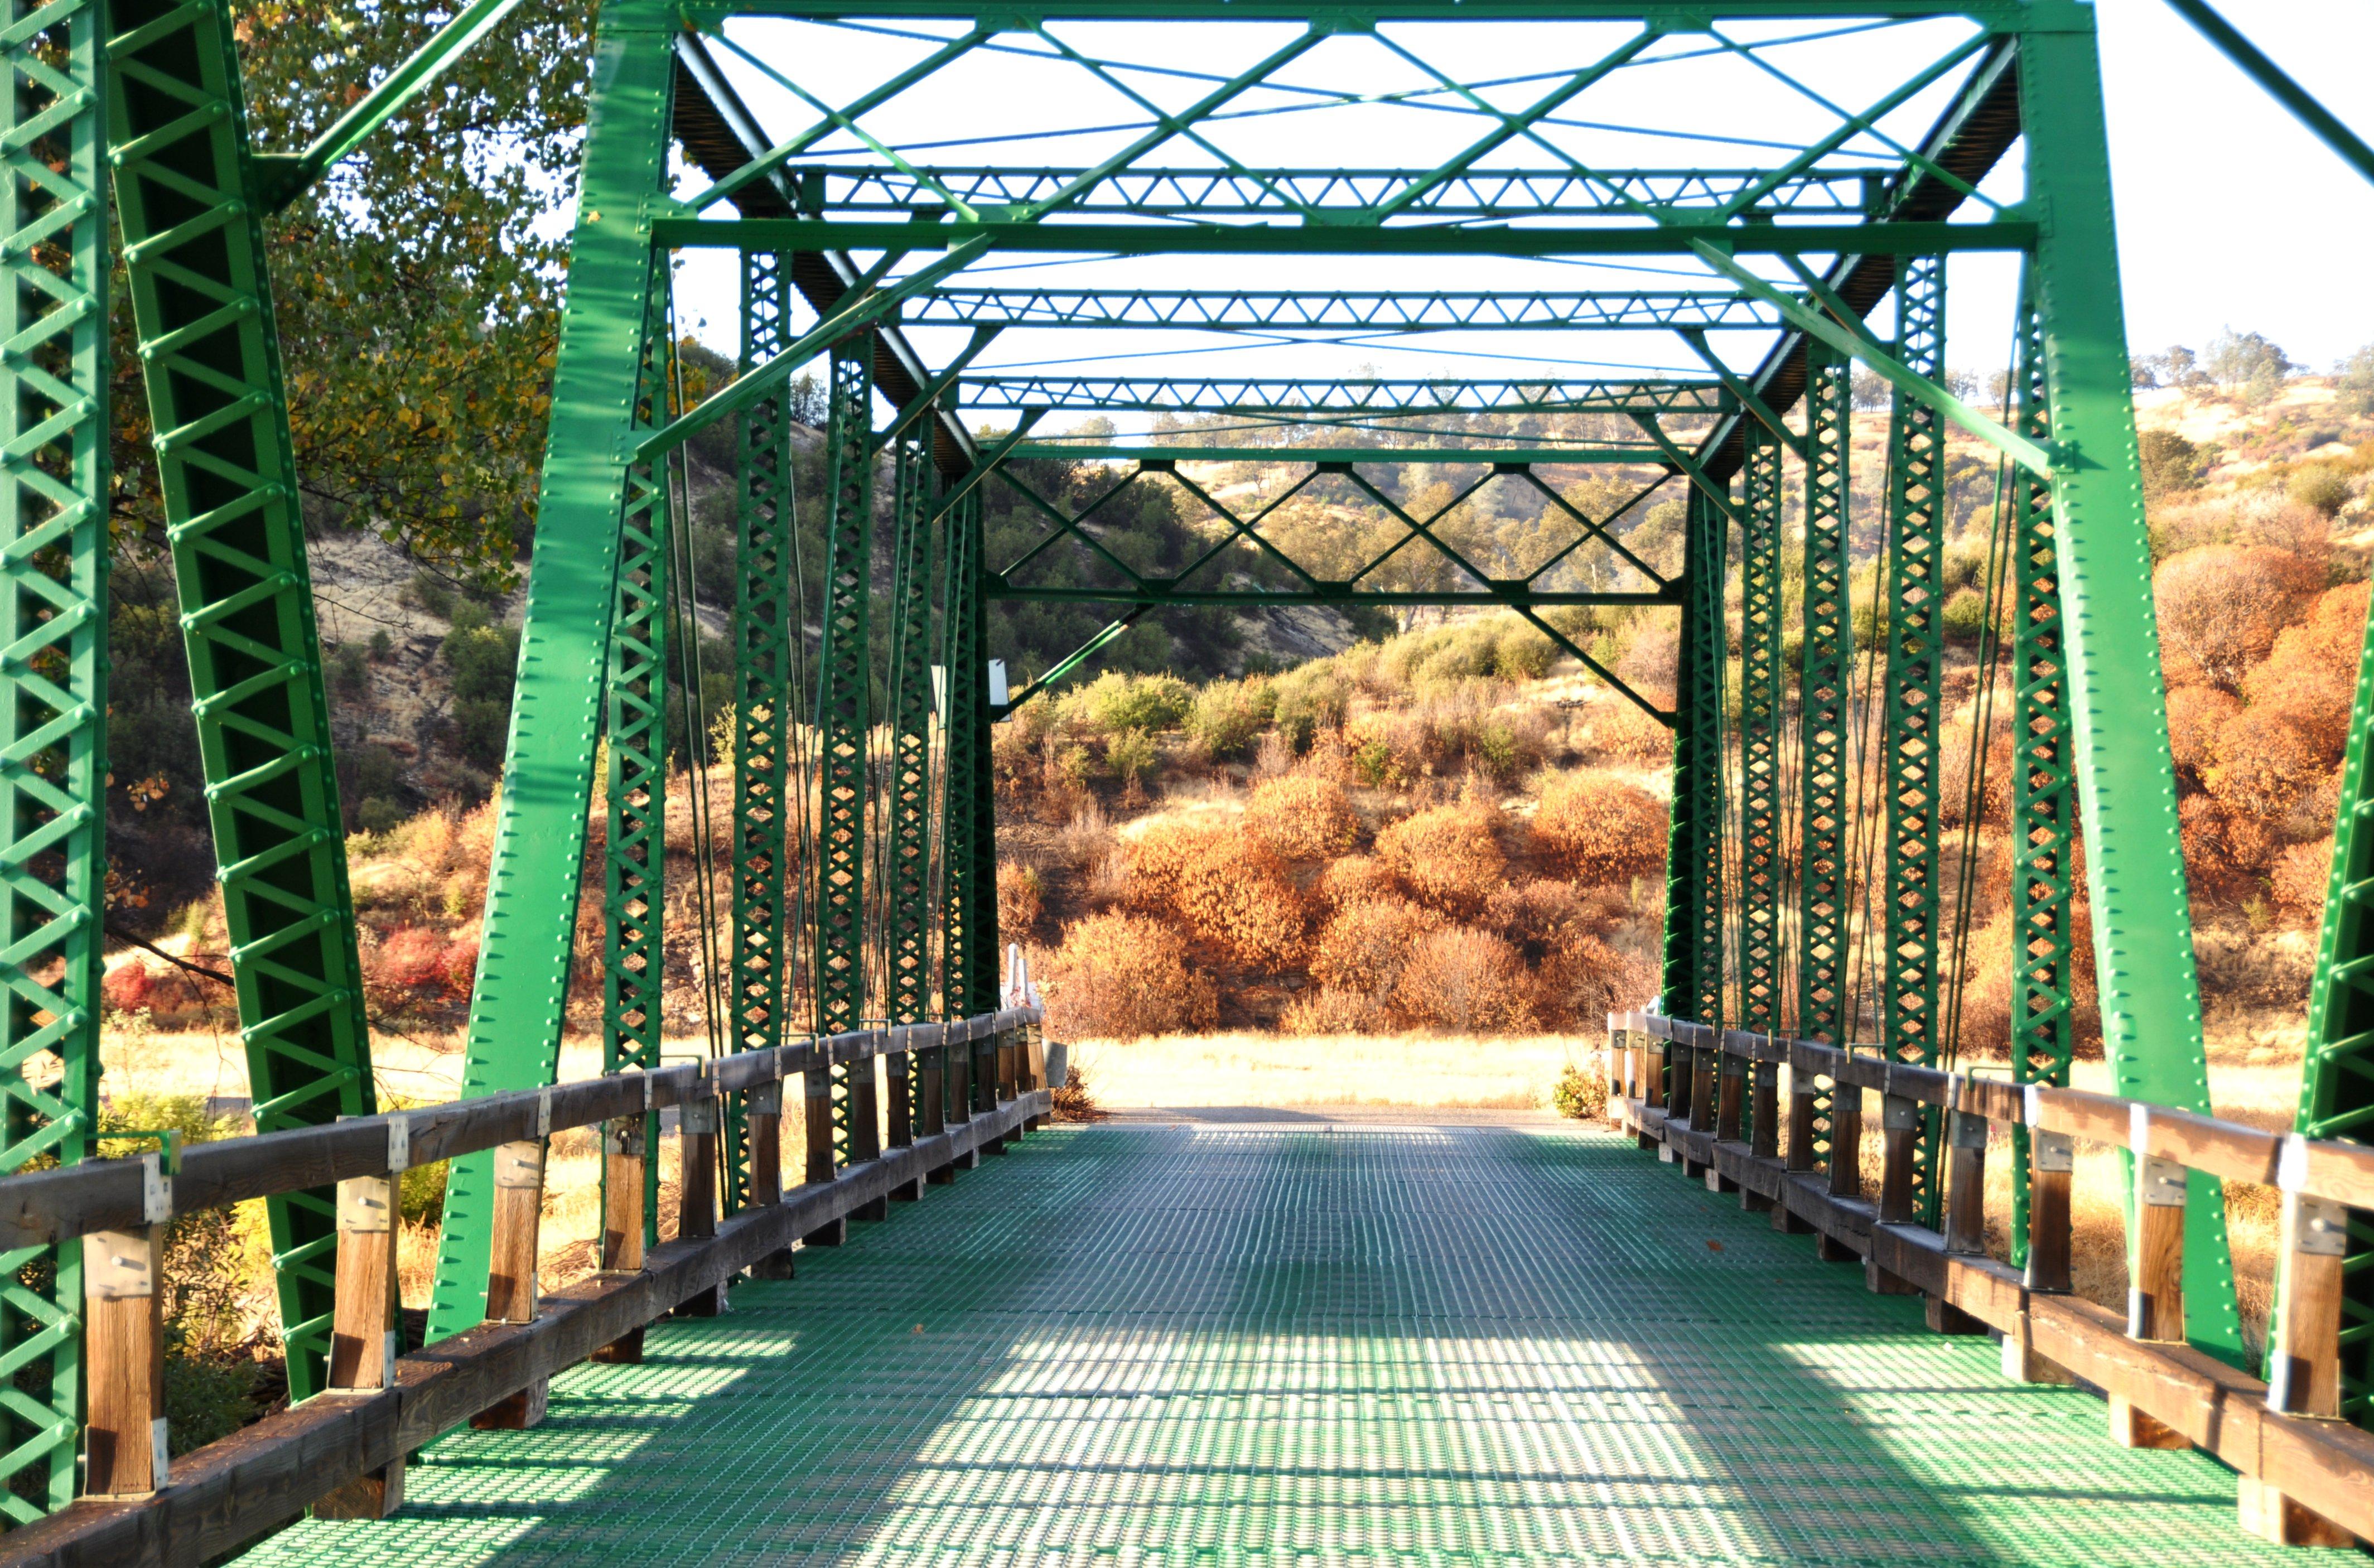 Bridge at Fort Hutner army base